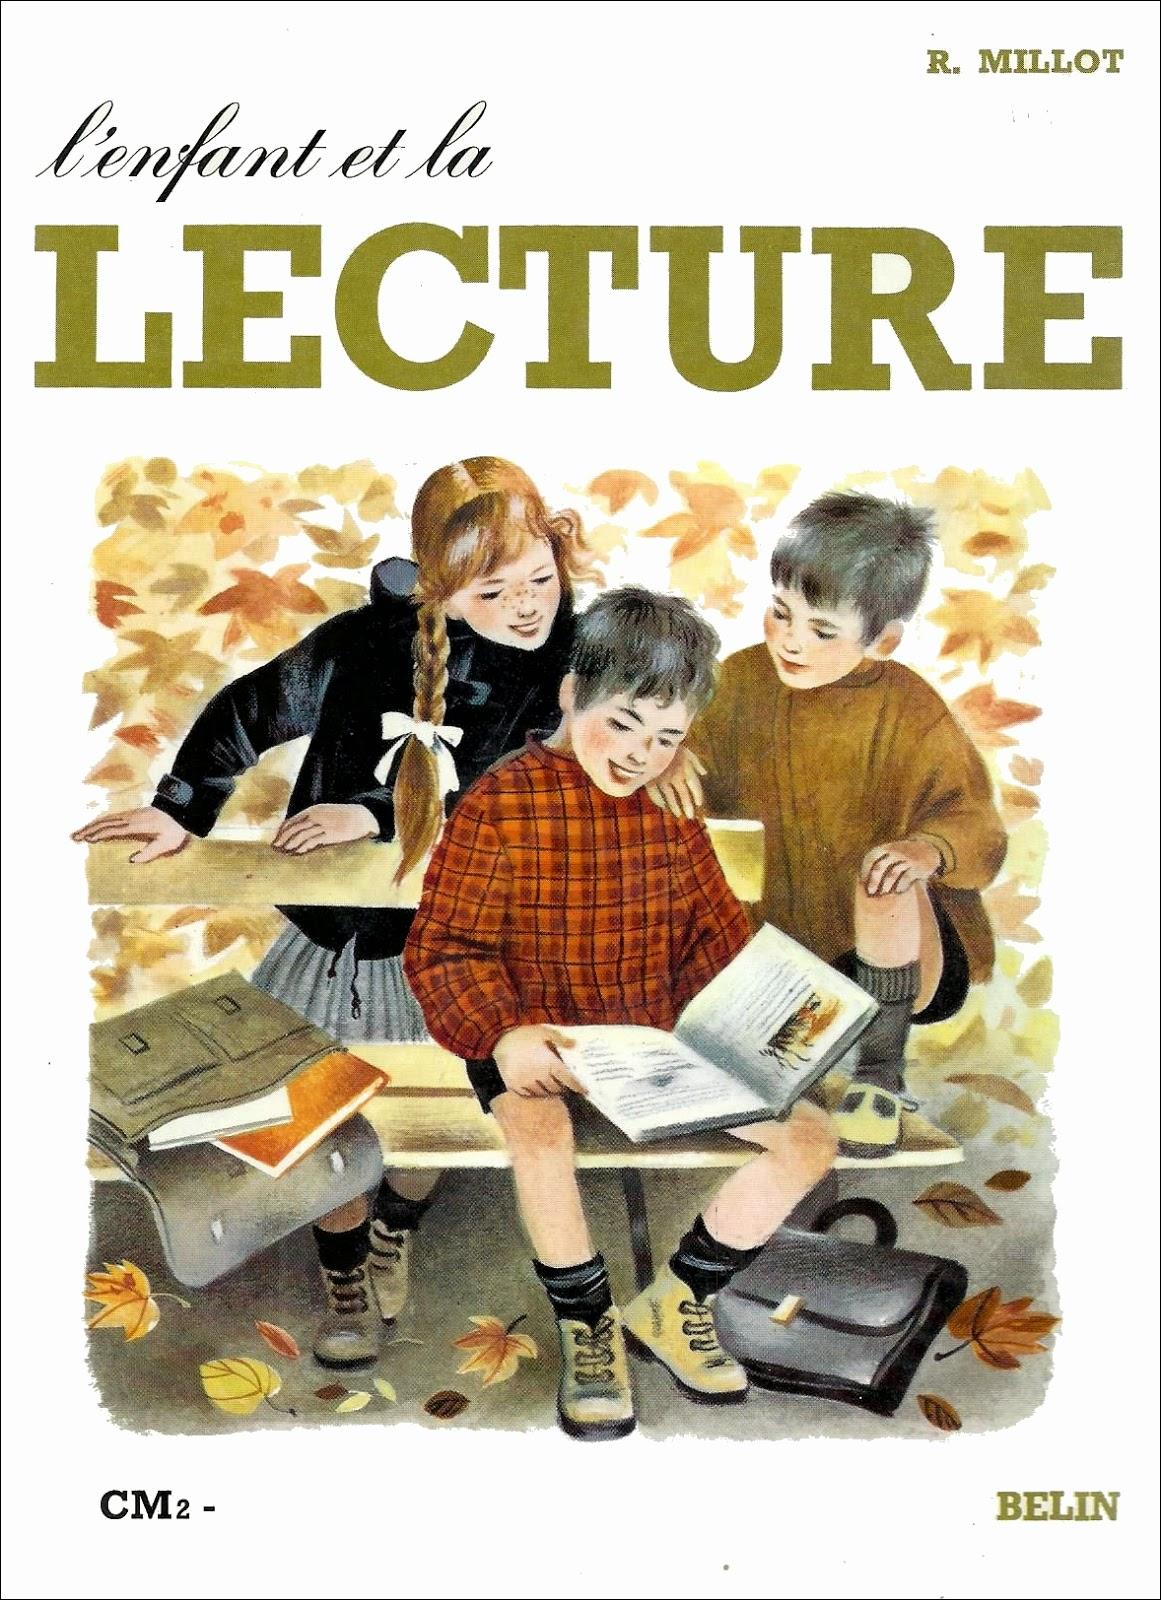 manuels anciens r millot l 39 enfant et la lecture cm2 1968. Black Bedroom Furniture Sets. Home Design Ideas